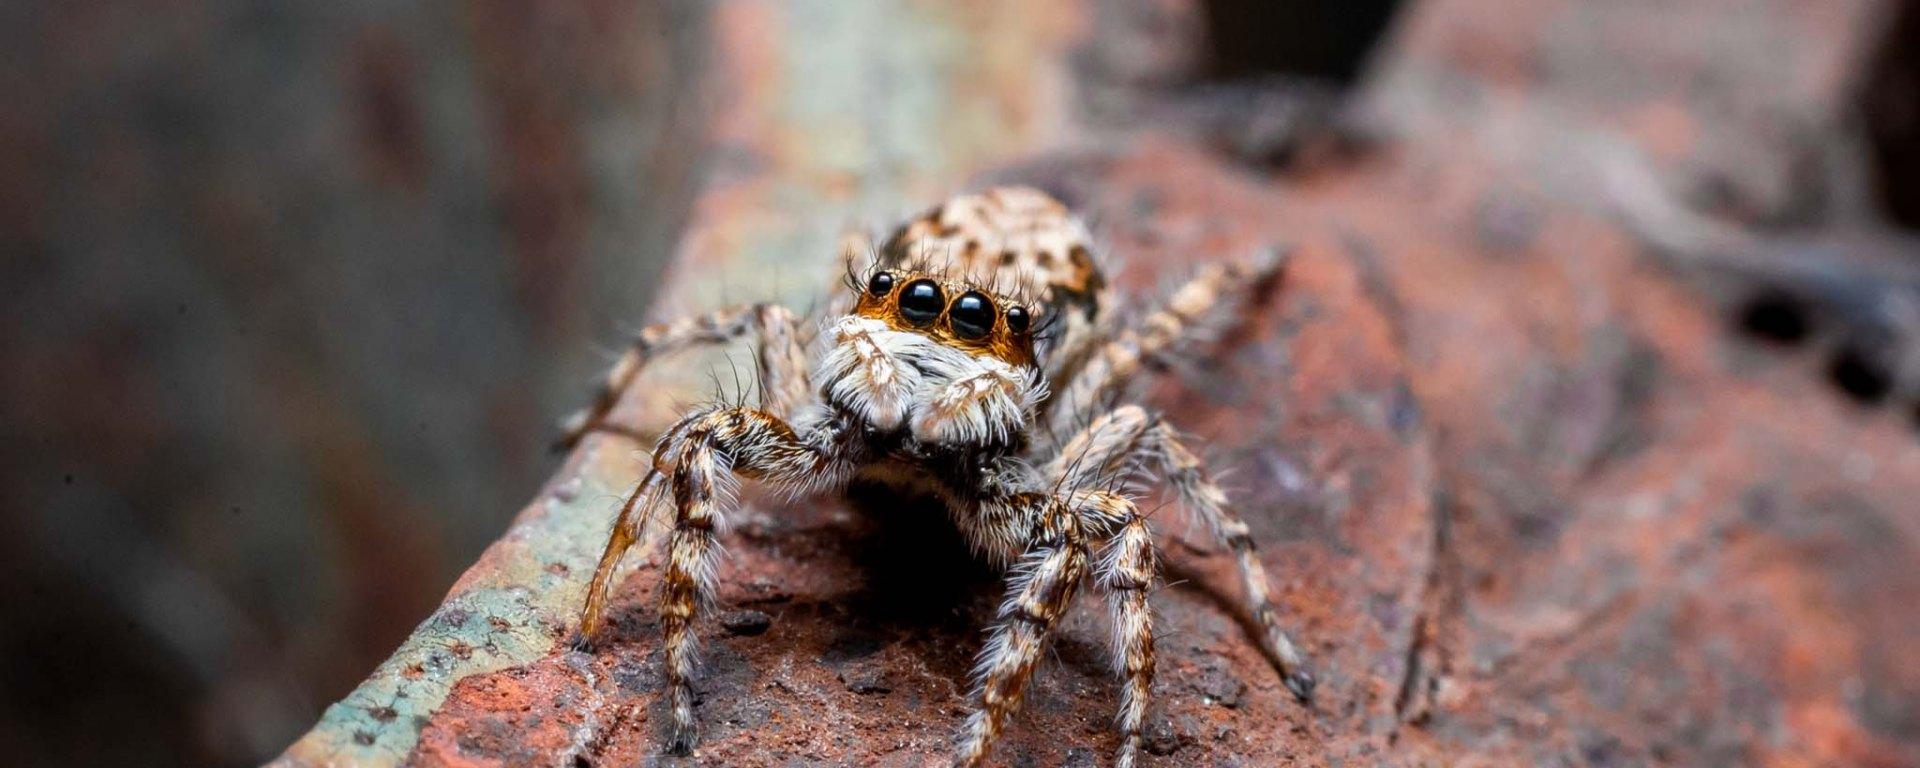 Macro photography Spiders Arachnids Bangalore